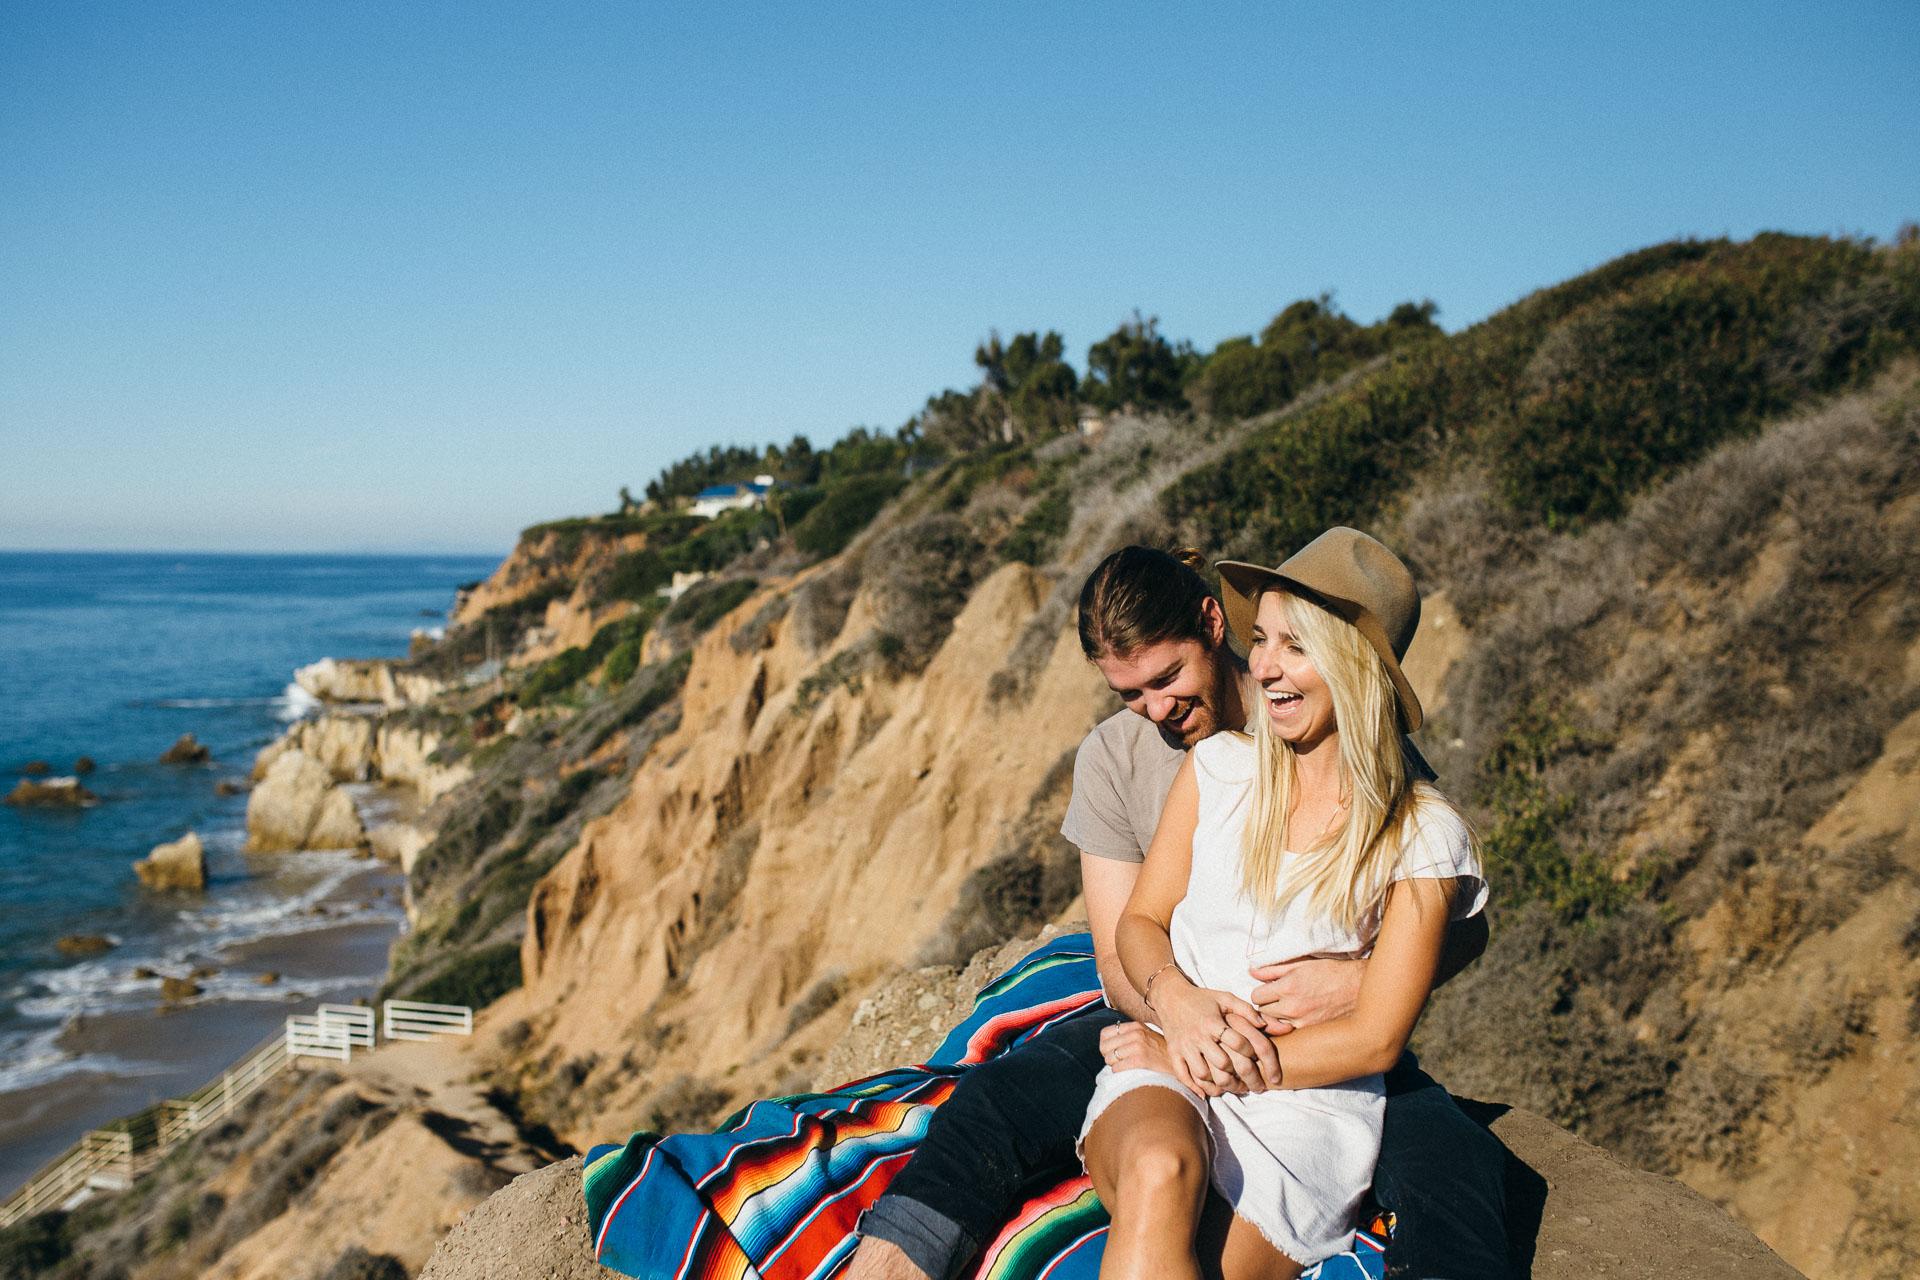 Carley_Jake_Lovesession_California_LosAngeles_ElMatadorBeach_JeanLaurentGaudy_001-7